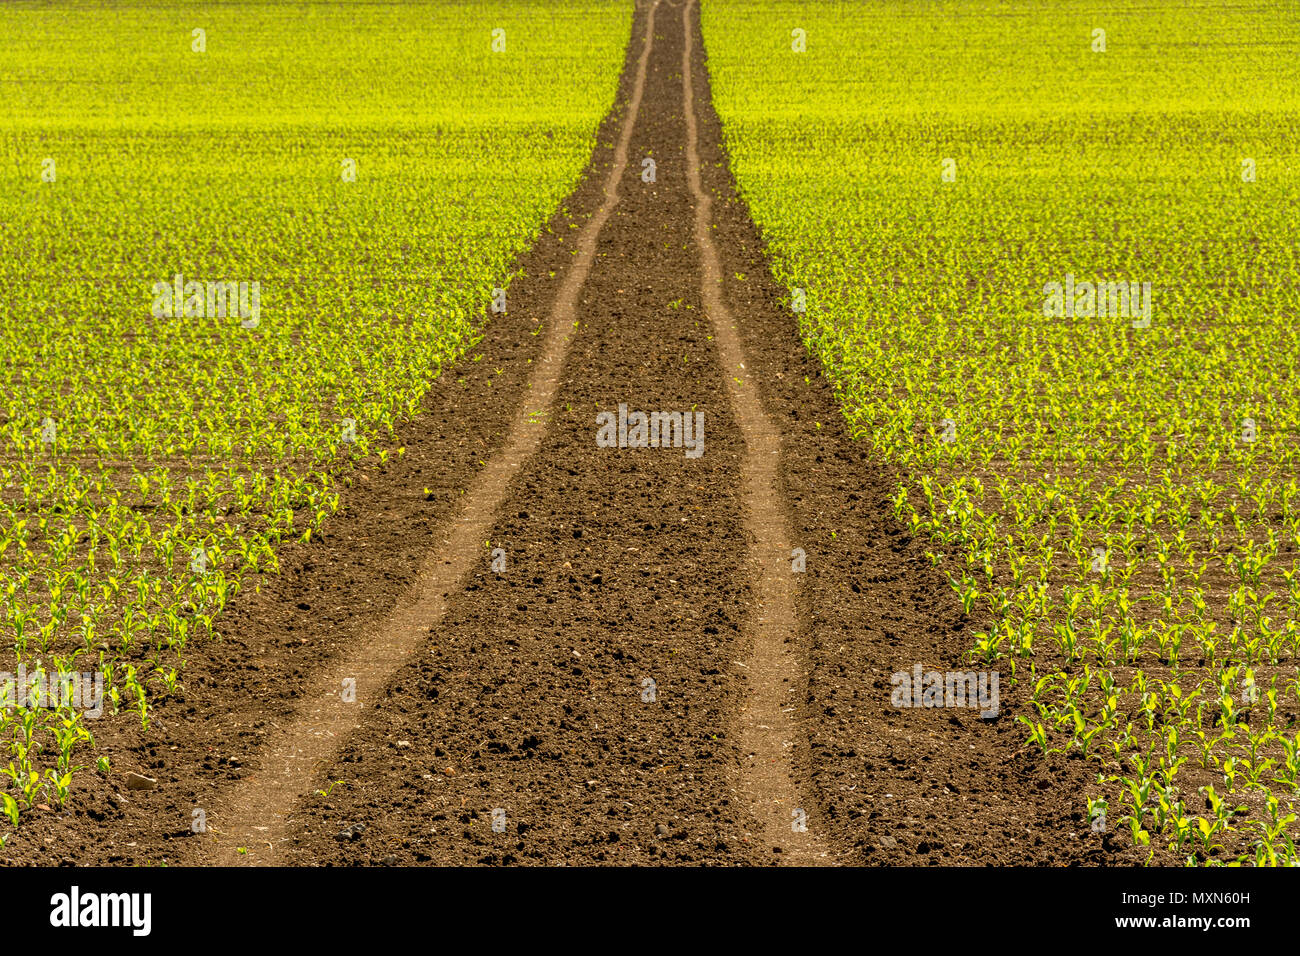 Tire tracks in a agricultural landscape, Puy de Dome , Auvergne Rhône Alpes, France - Stock Image